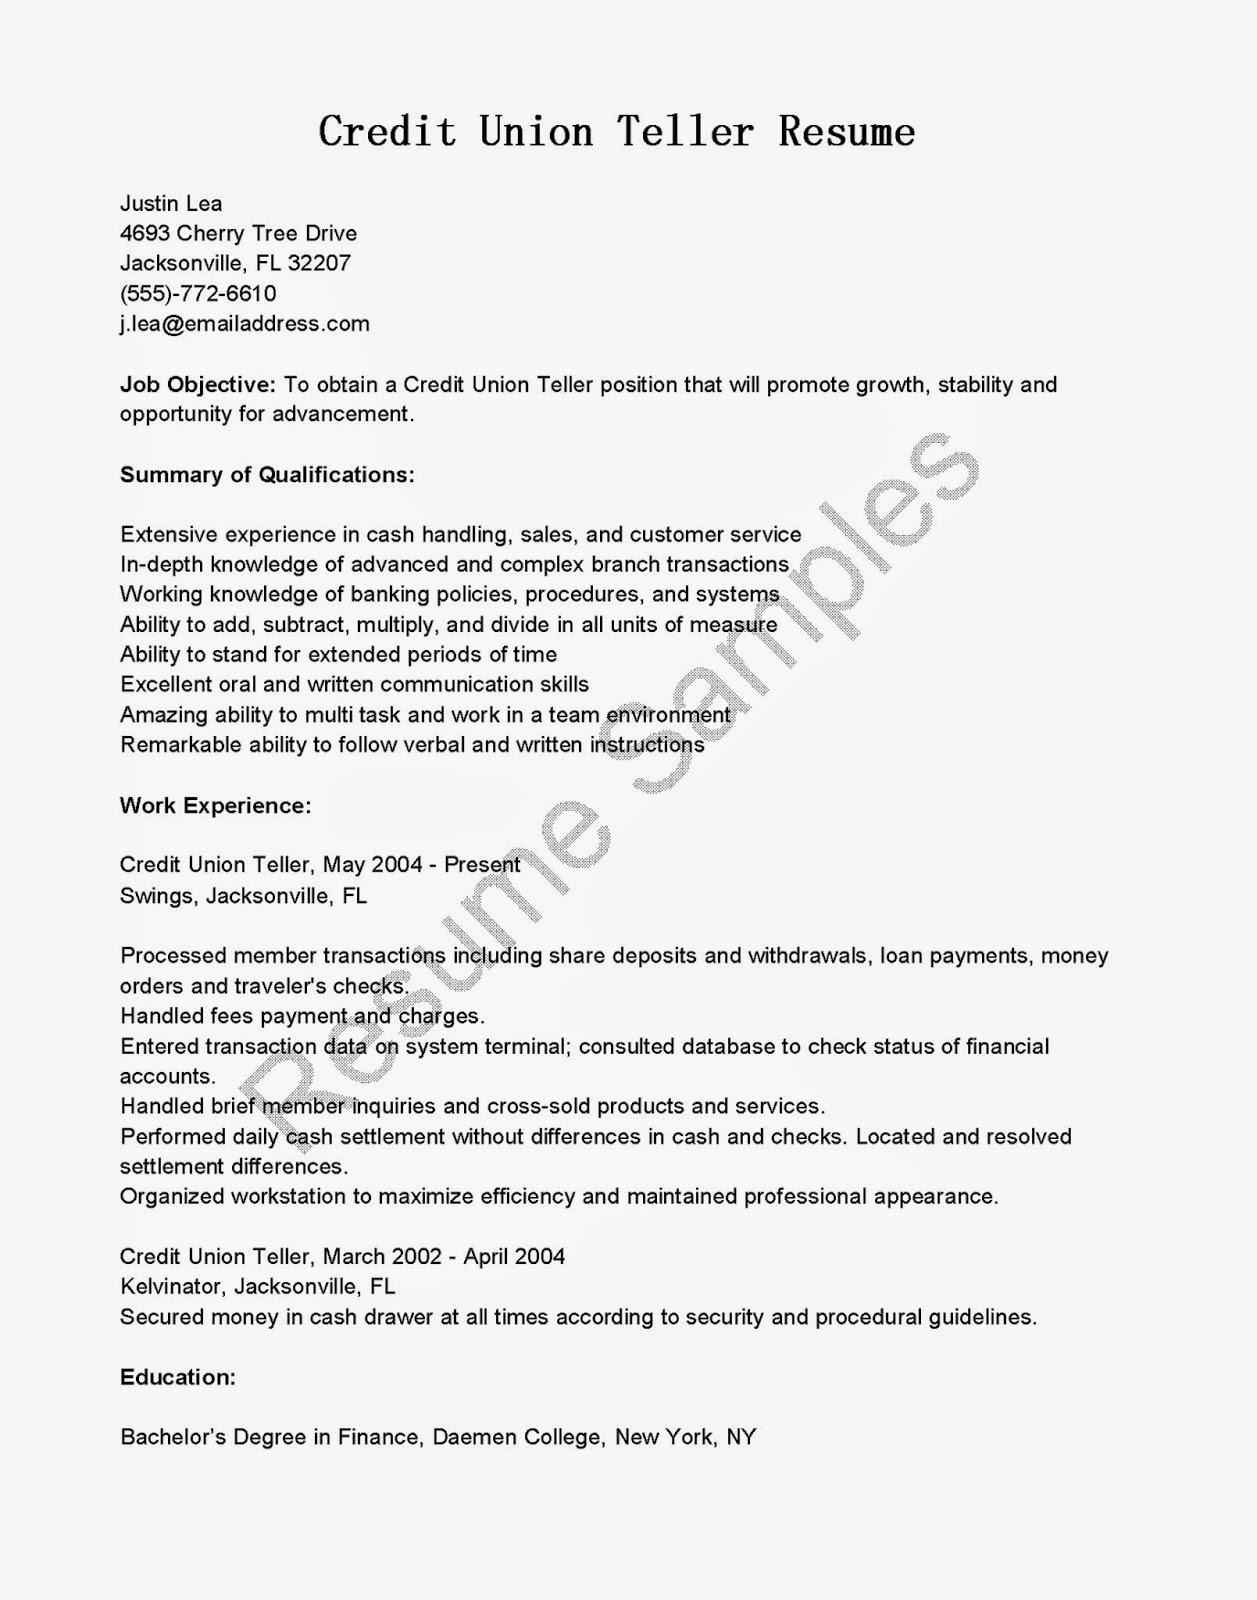 Bank Teller Resume No Experience Doc Www Mittnastaliv Tk Bank Teller Skills  Resumes Uhpy Is Resume  Teller Job Description Resume